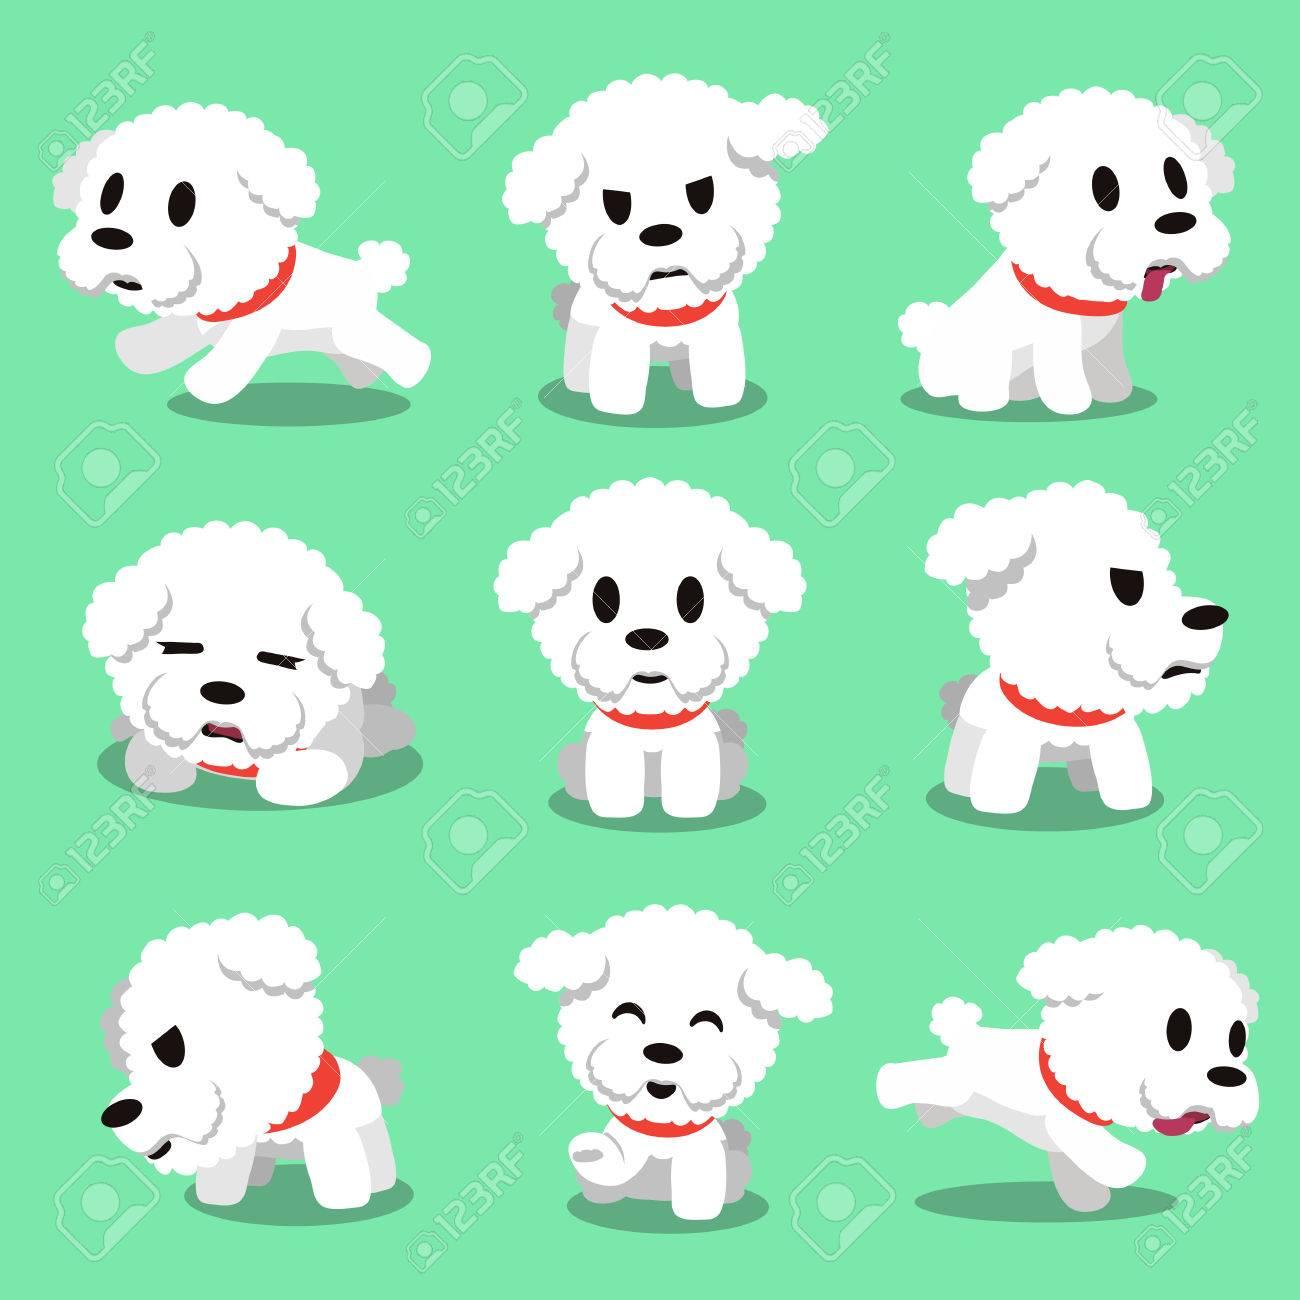 Cartoon character bichon frise dog poses - 50264103